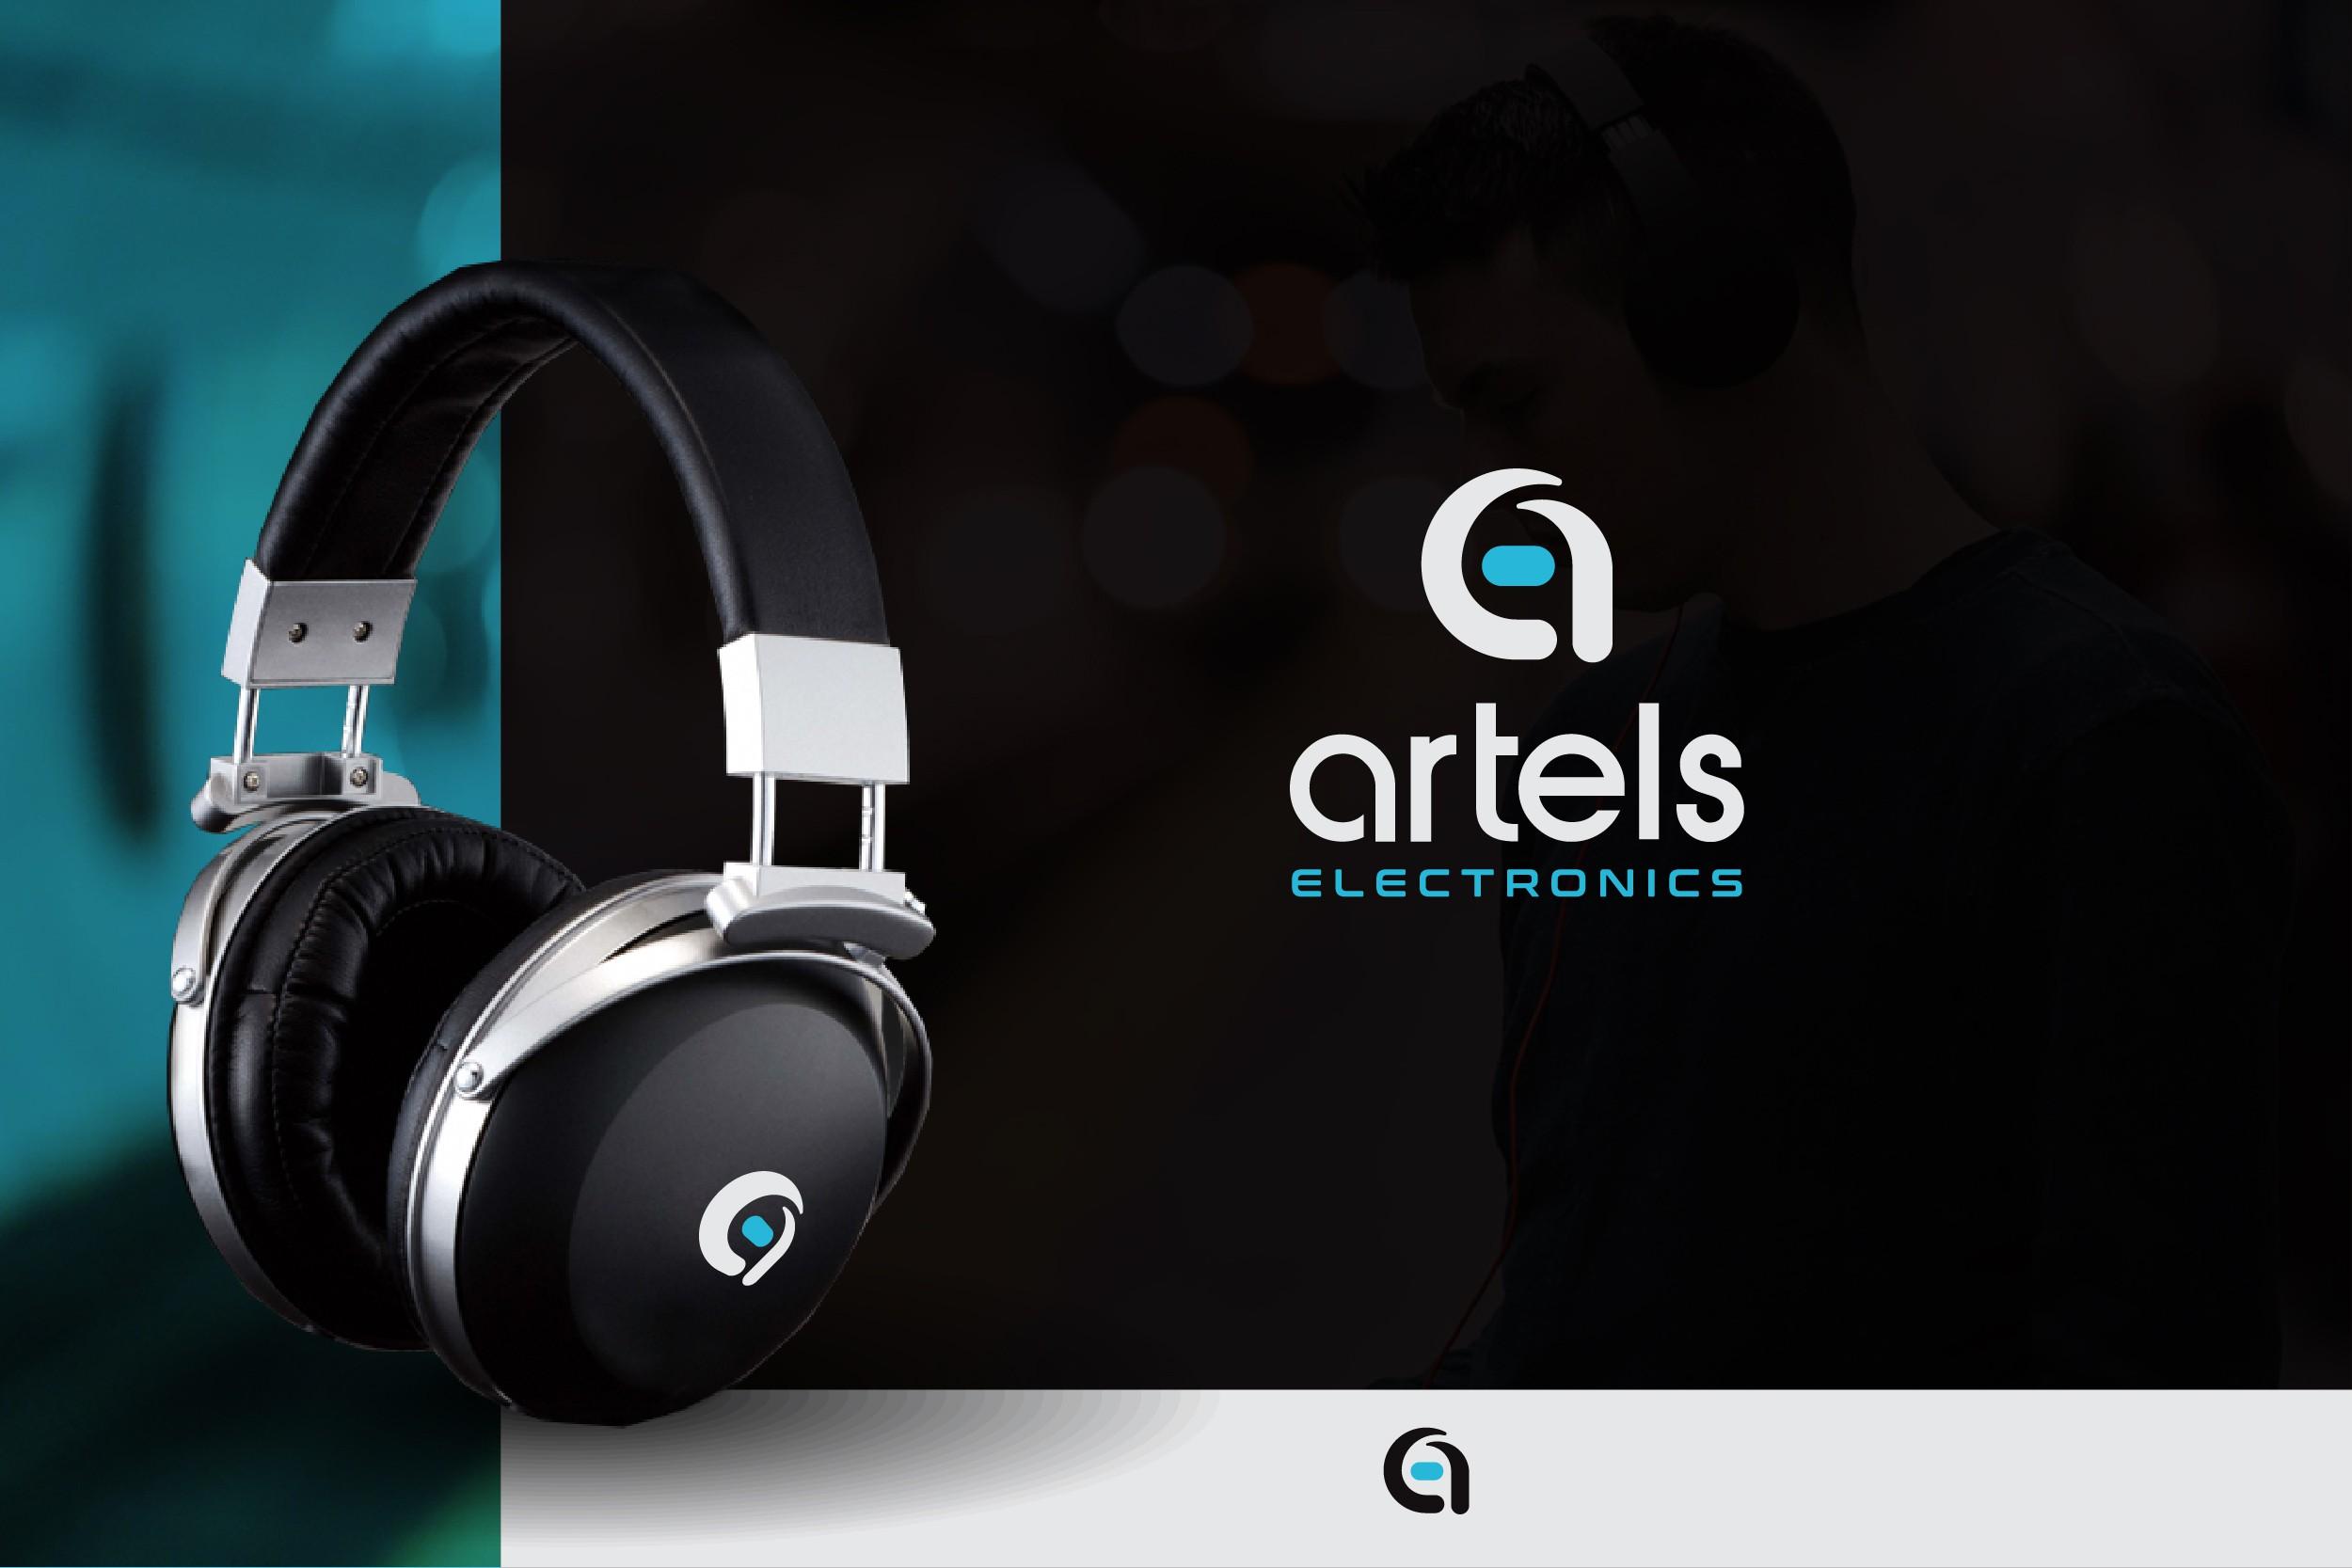 Echo bud ear phones, Noise reduction